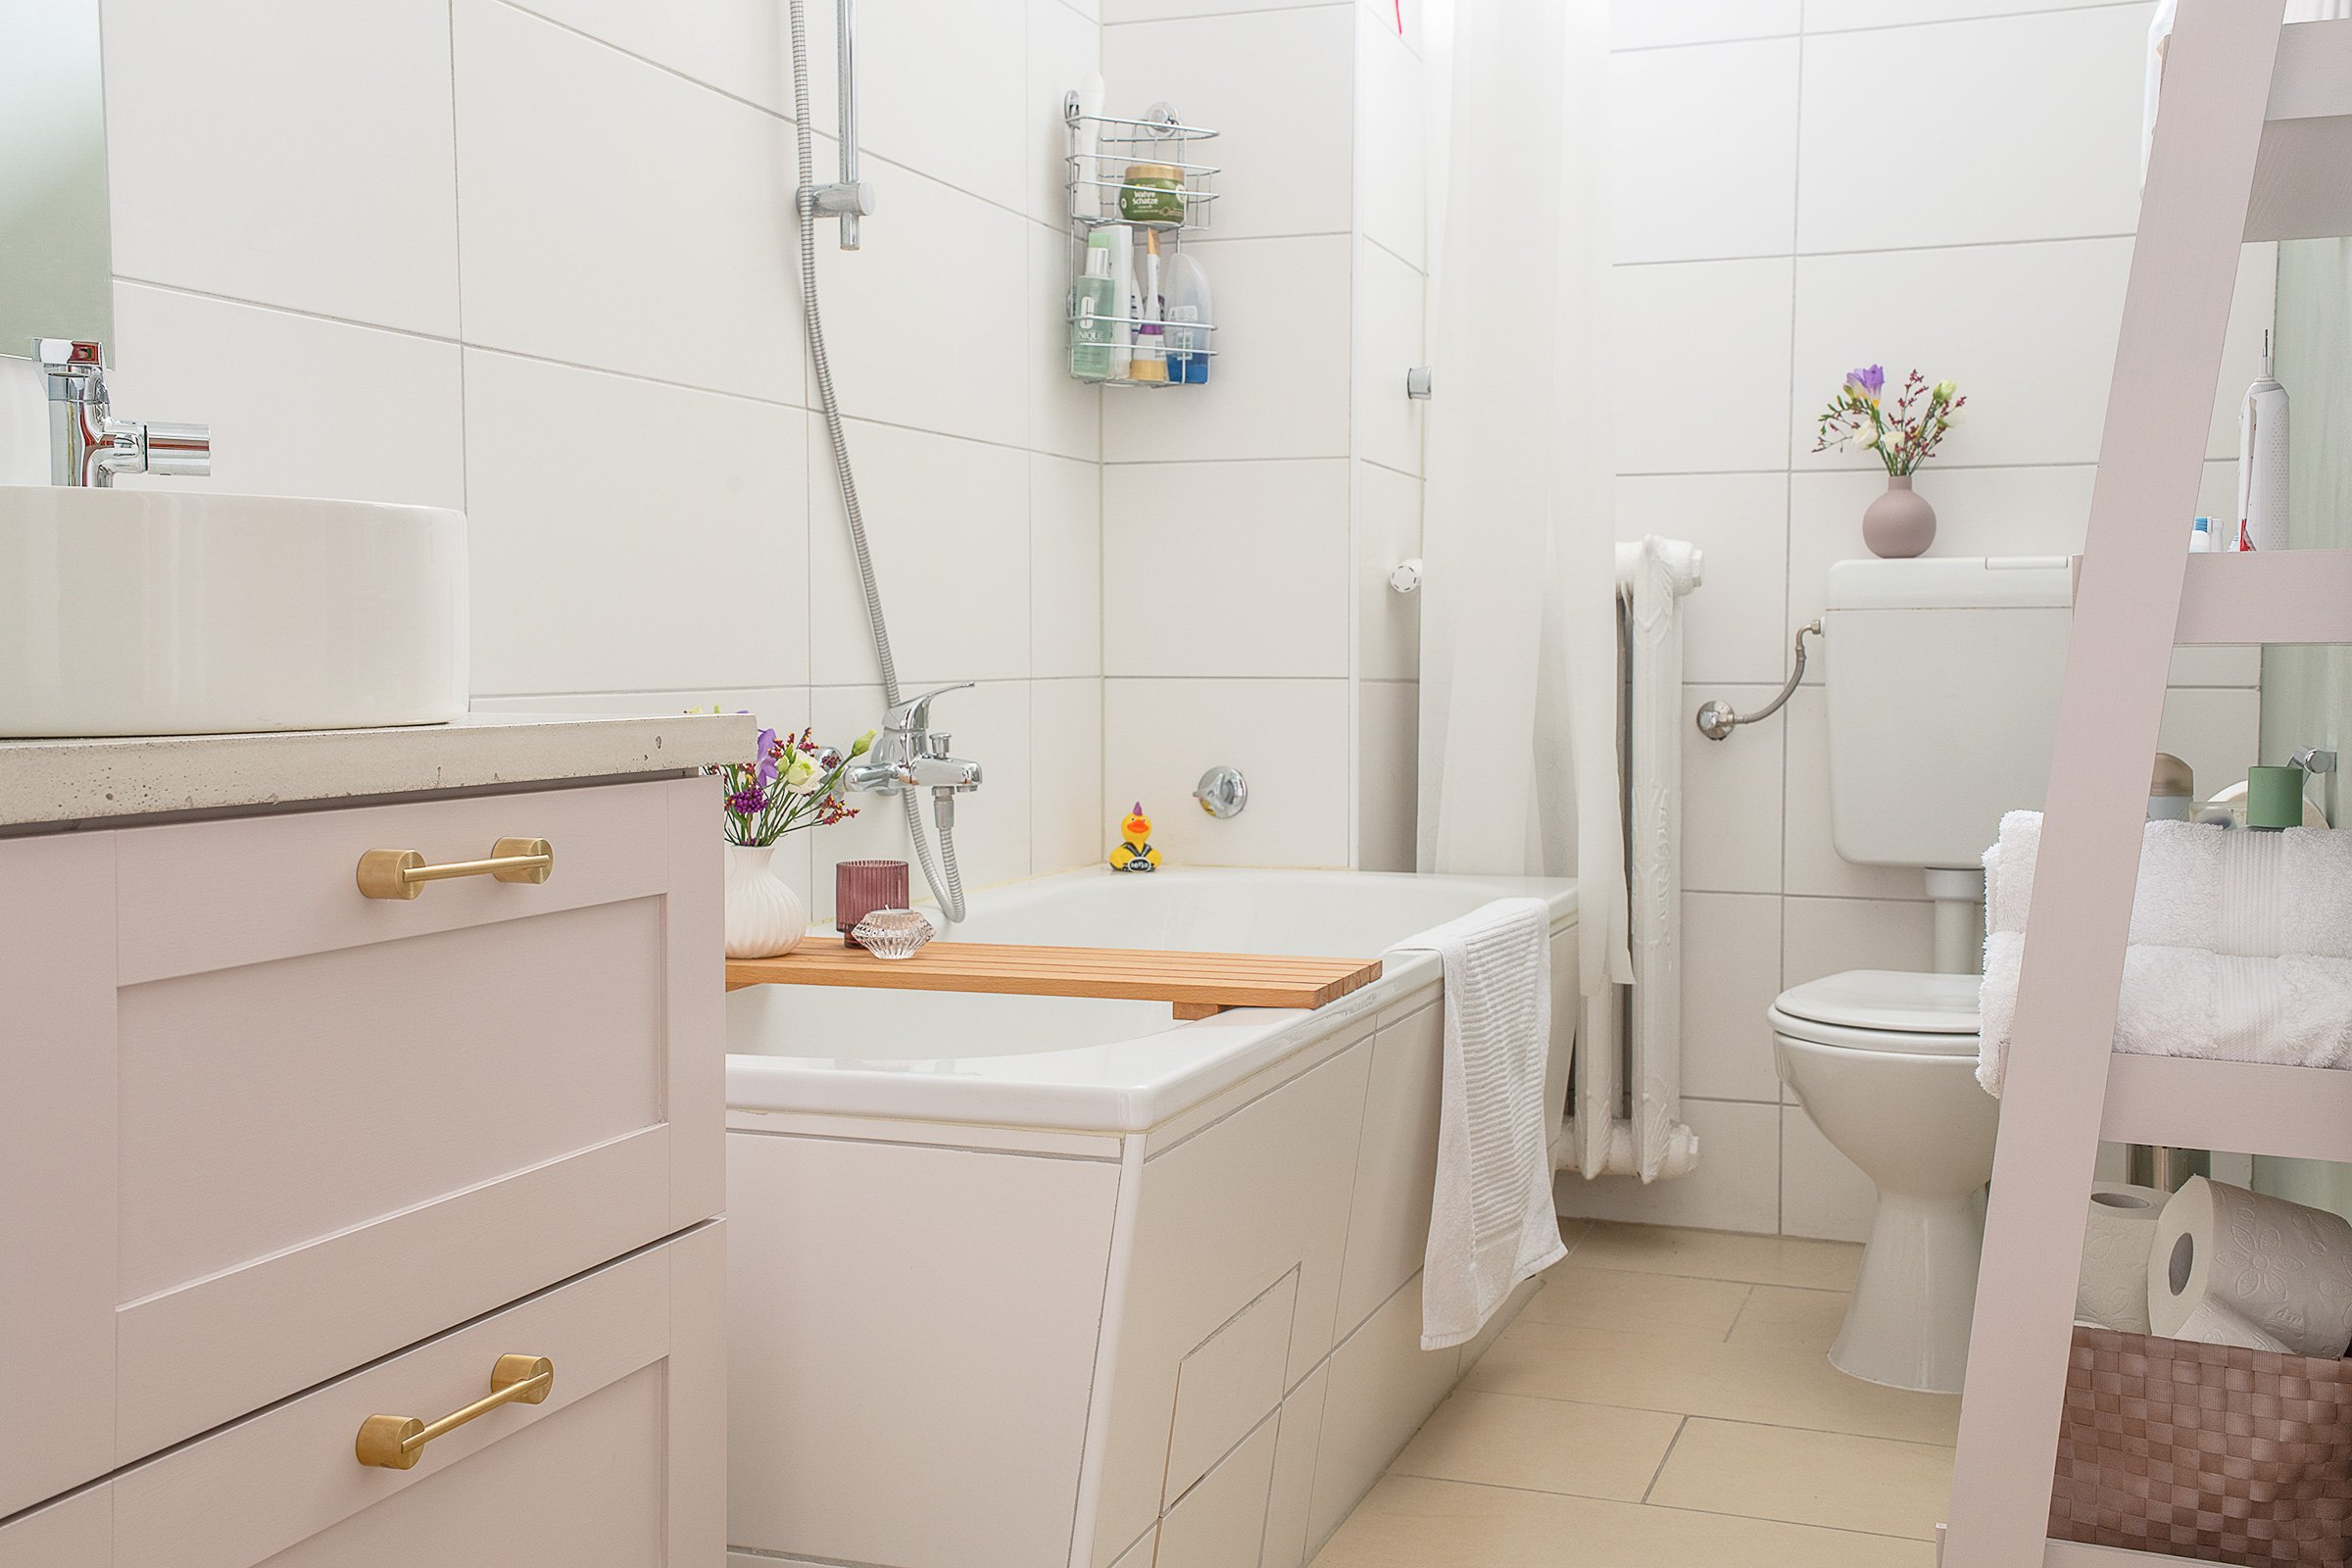 Bathroom Makeover with Kohler Mica Washbasin & Composed Tap | Little House On The Corner